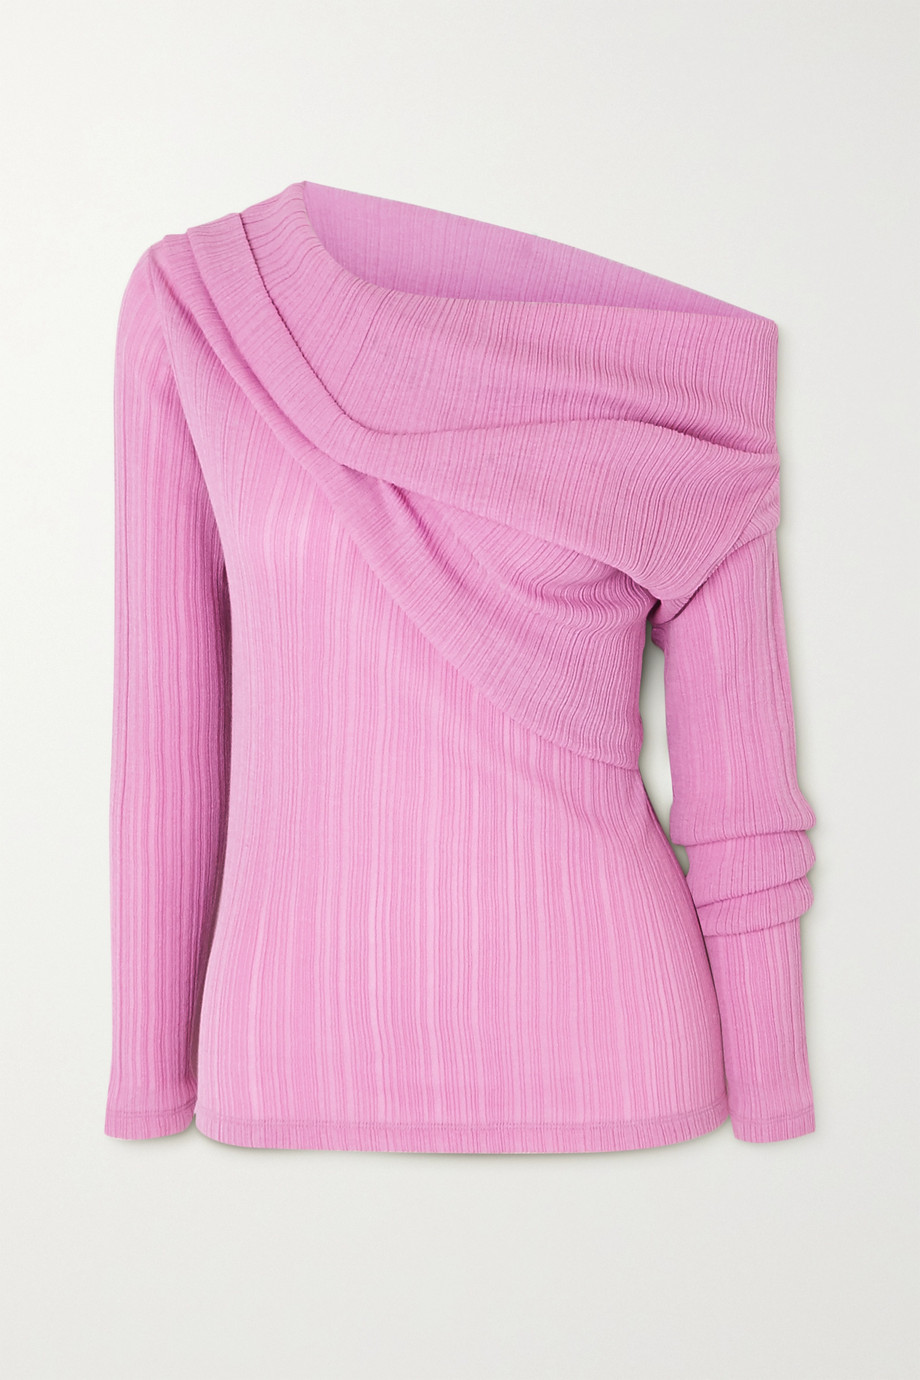 Nina Ricci Draped plissé cotton-blend top